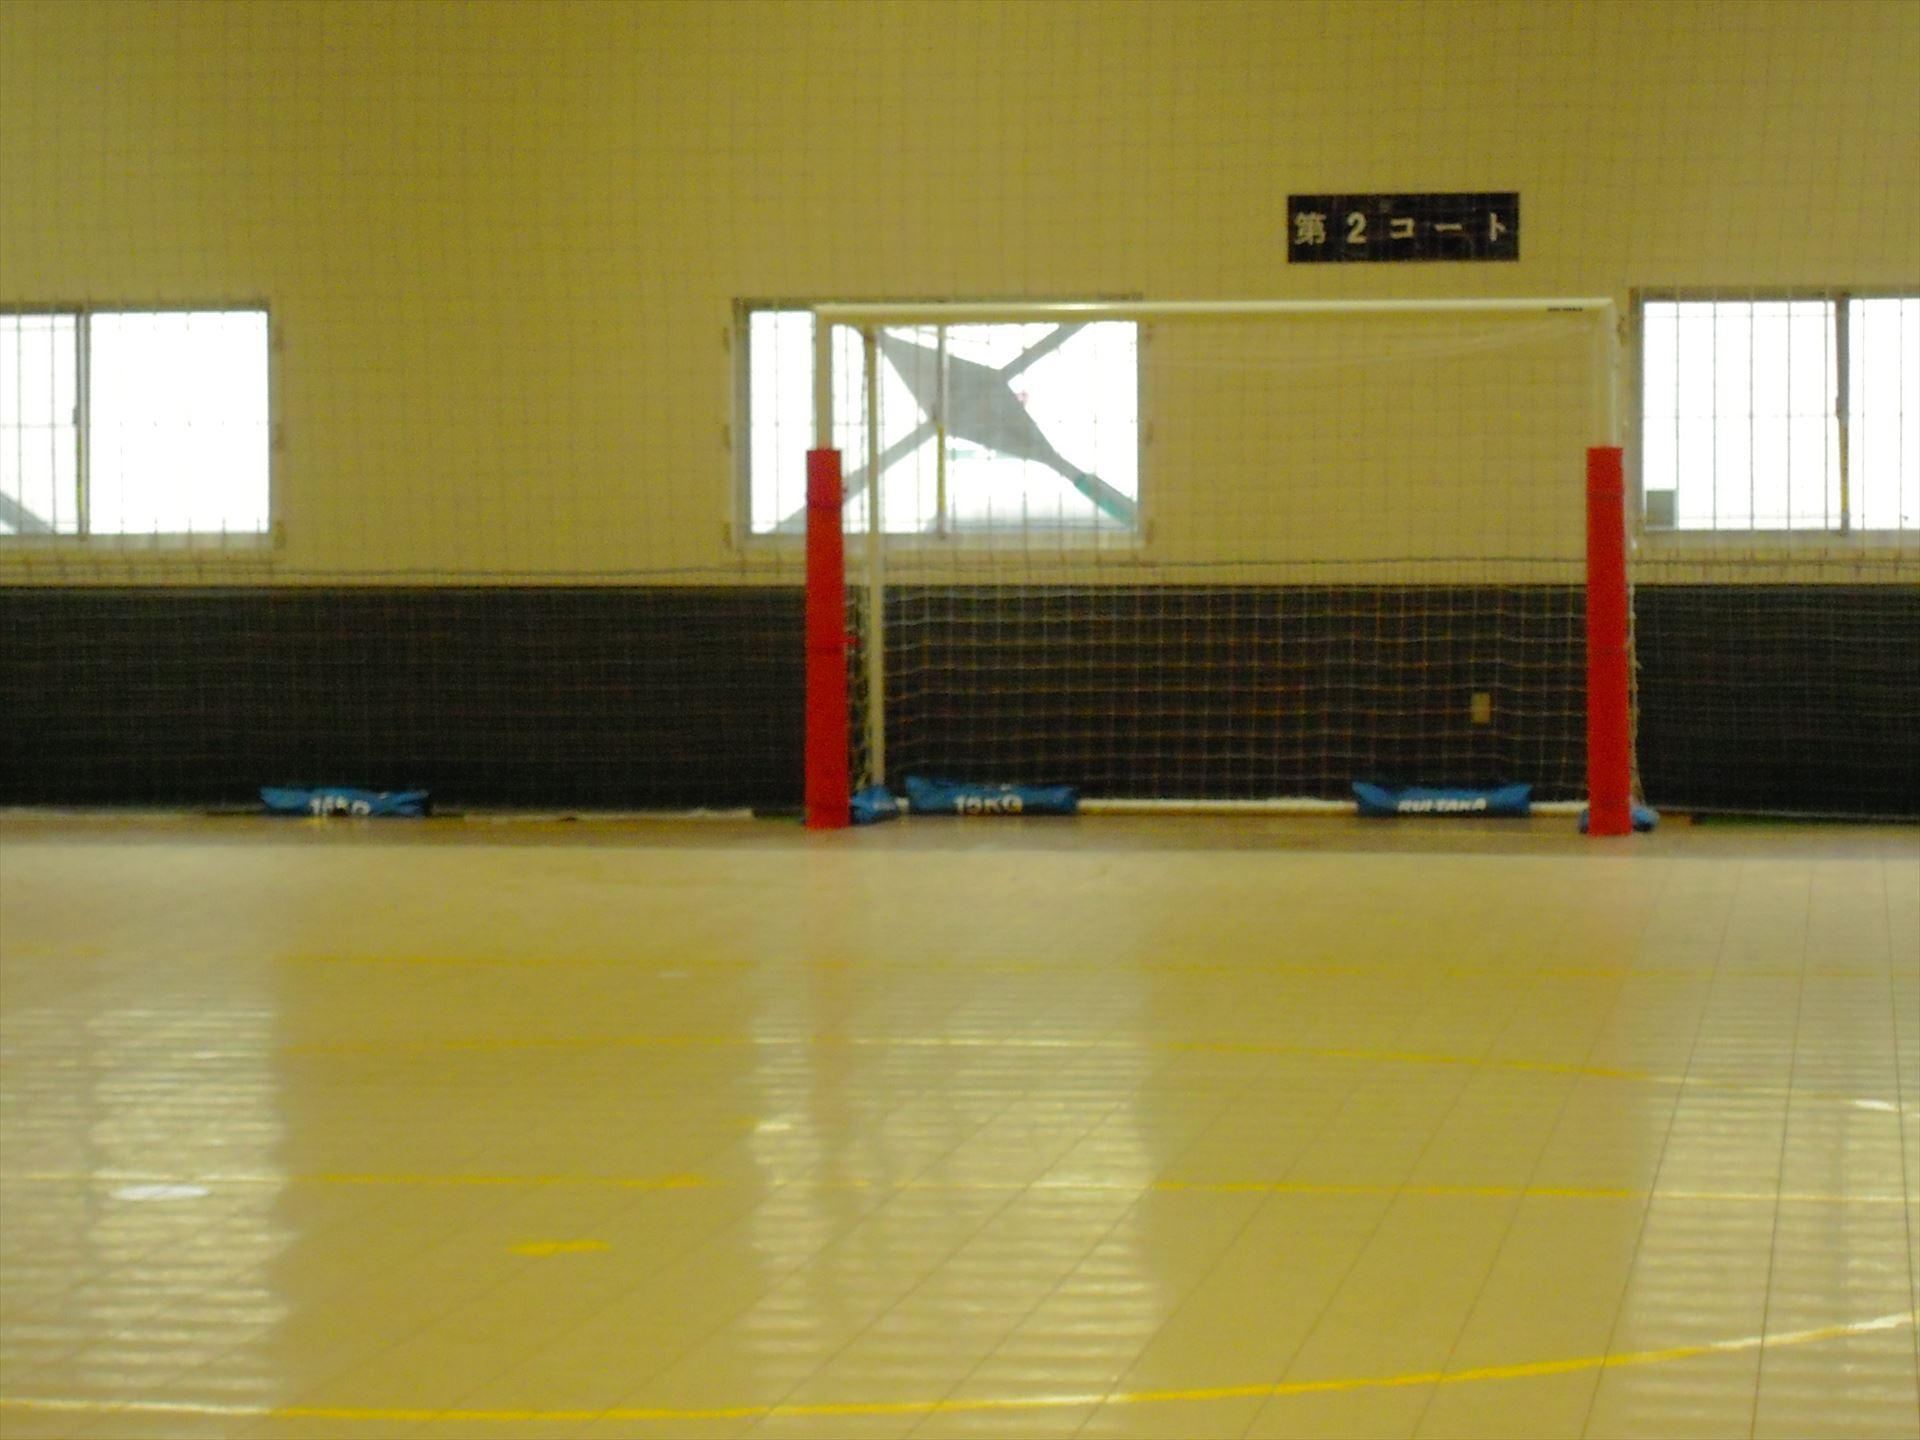 futsal-court-201504.jpg